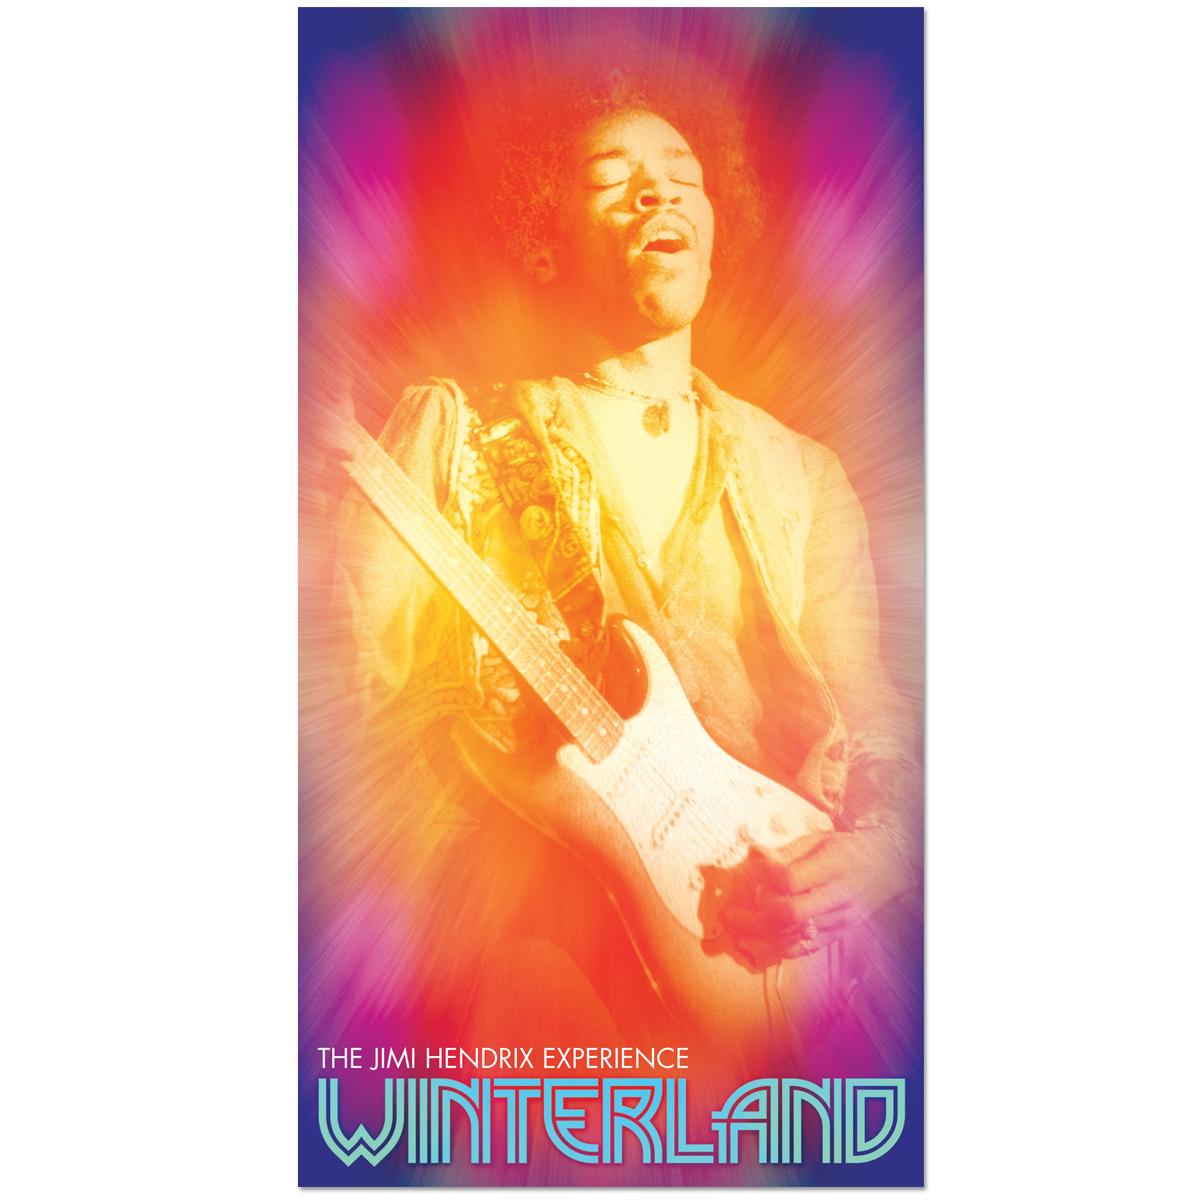 The Jimi Hendrix Experience: Winterland 4-CD Digipak